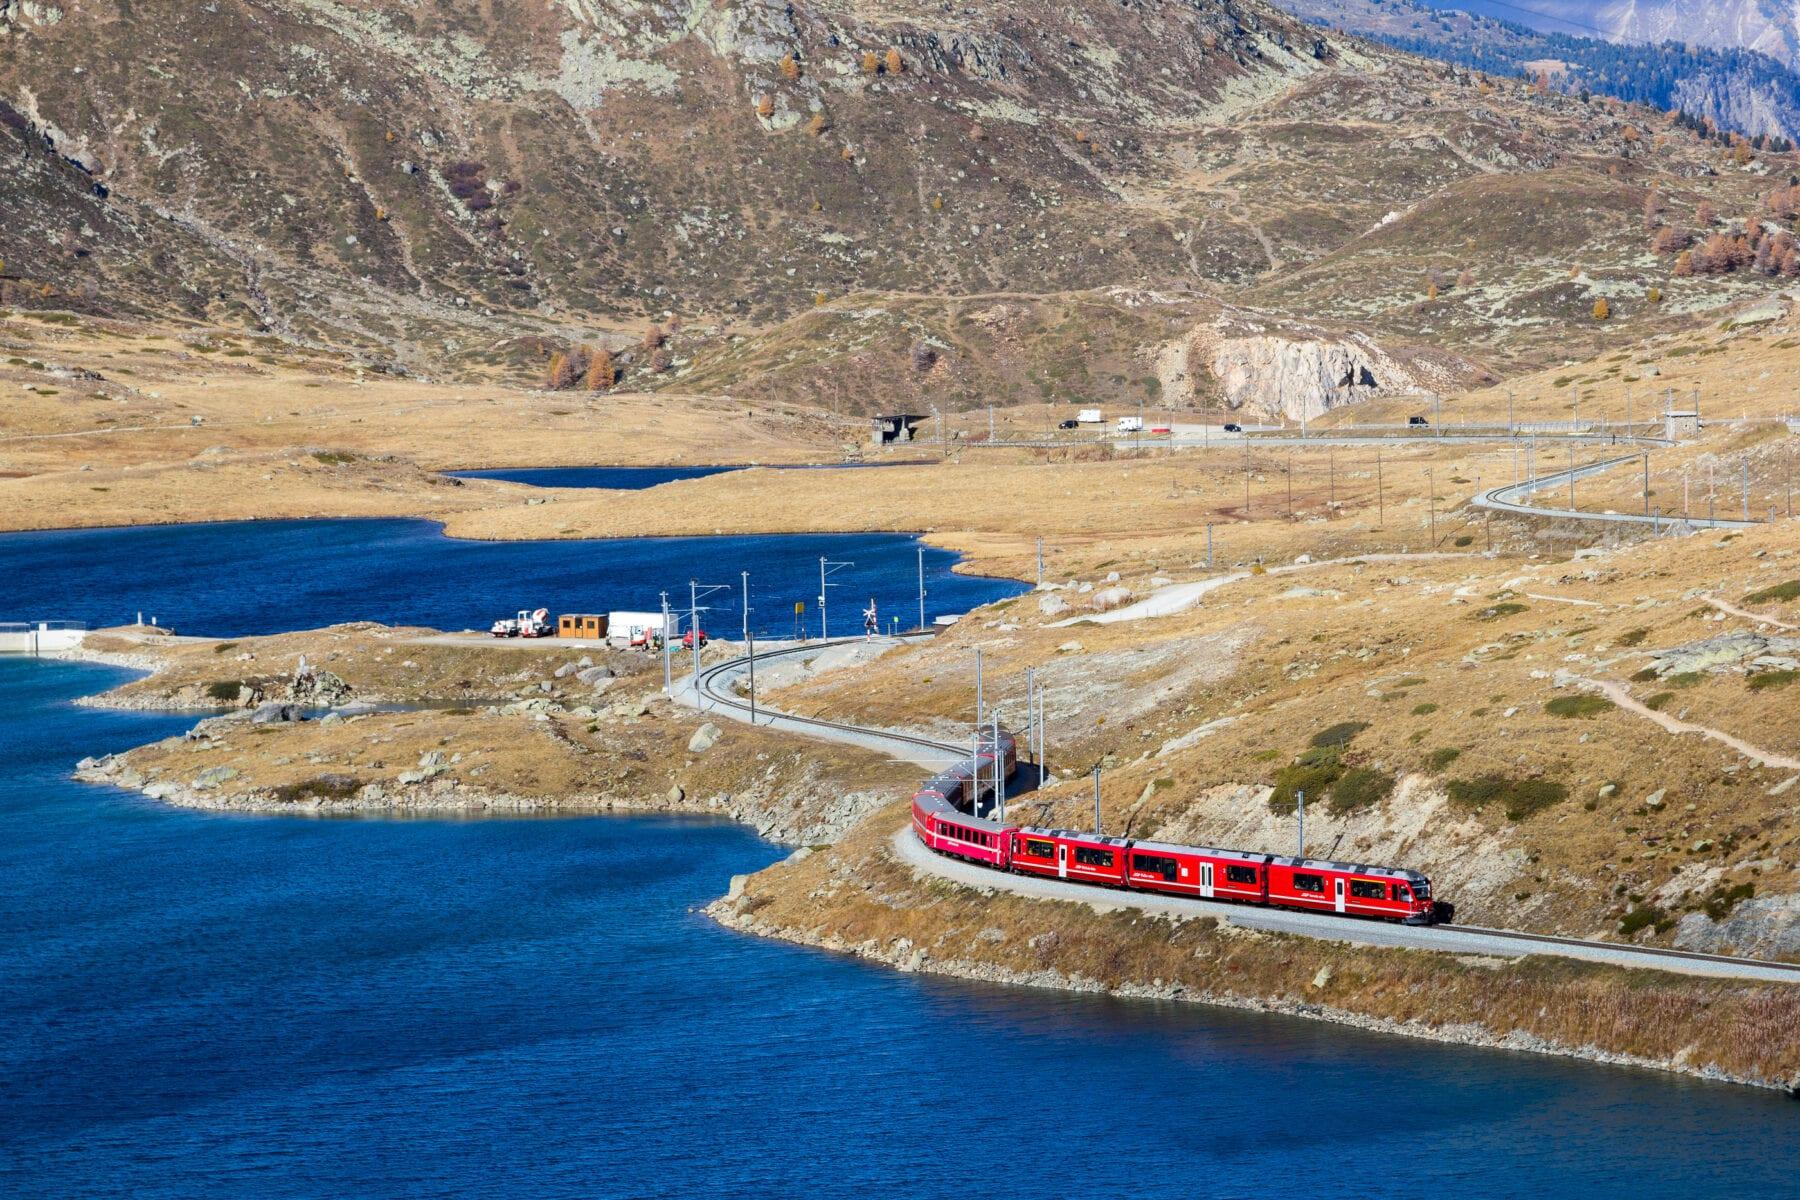 Mooiste treinreizen Europa Bernina Express